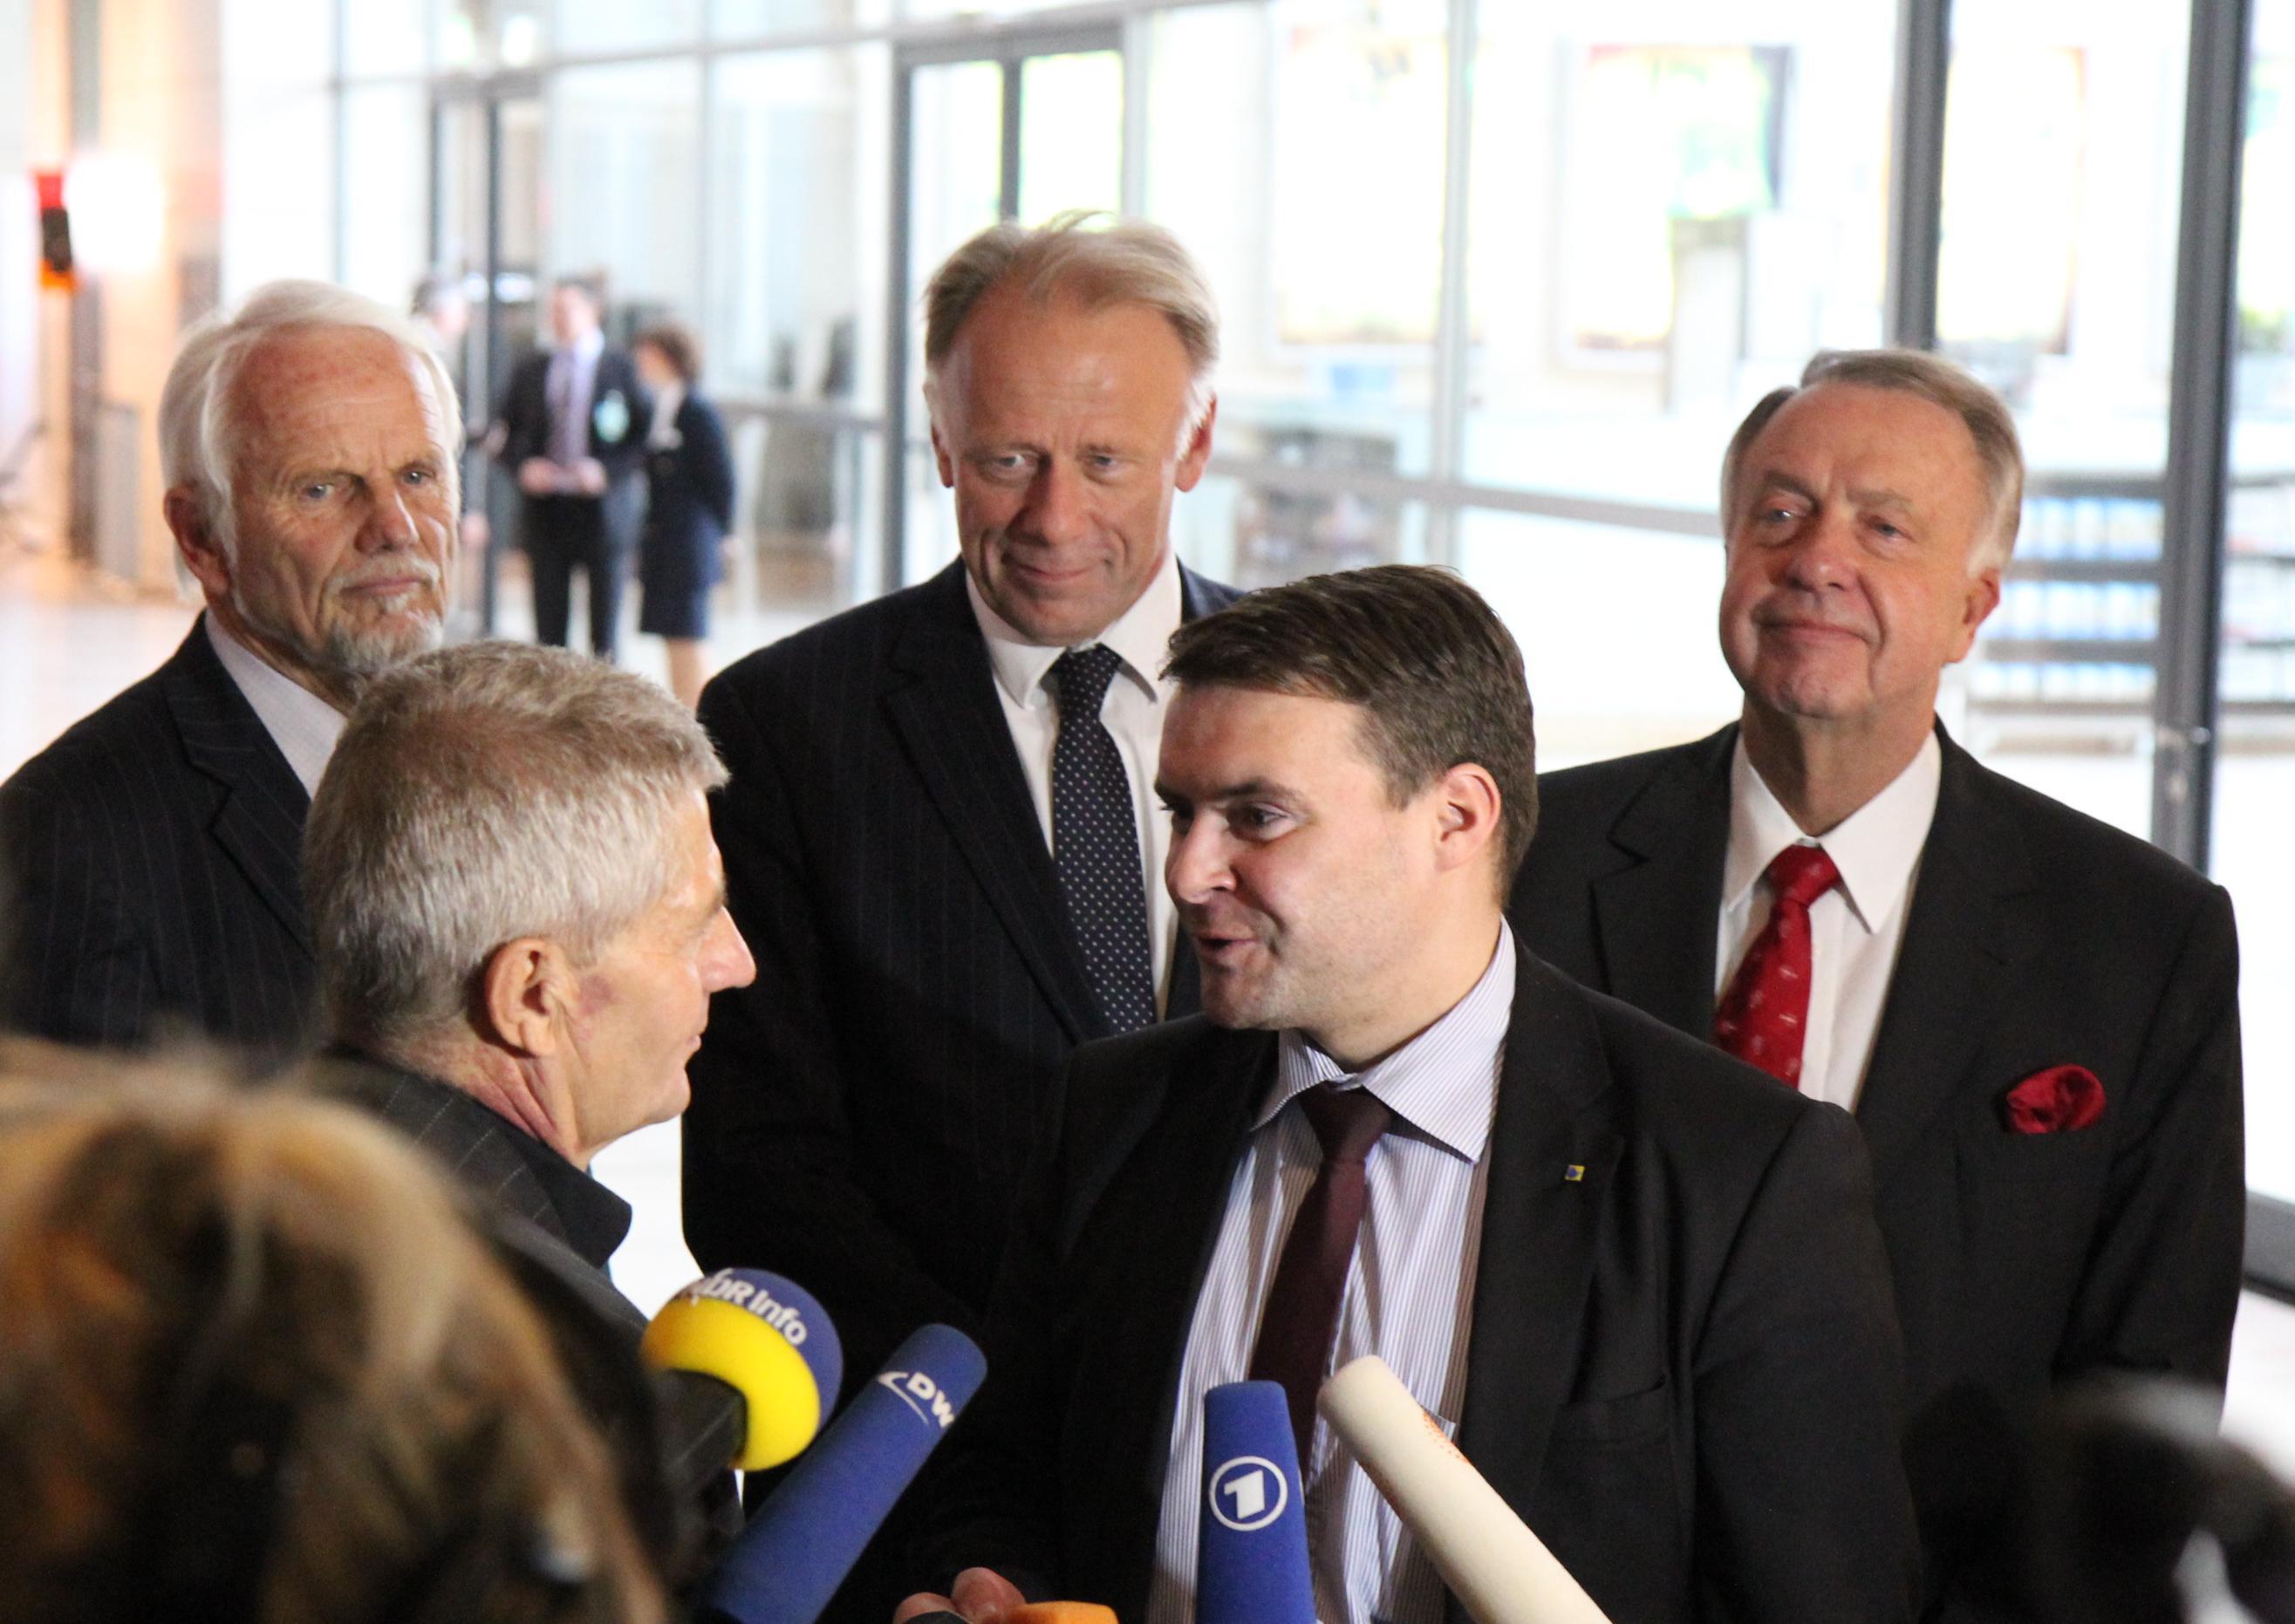 Patrick Kurth, MdB (r.) gratuliert Roland Jahn